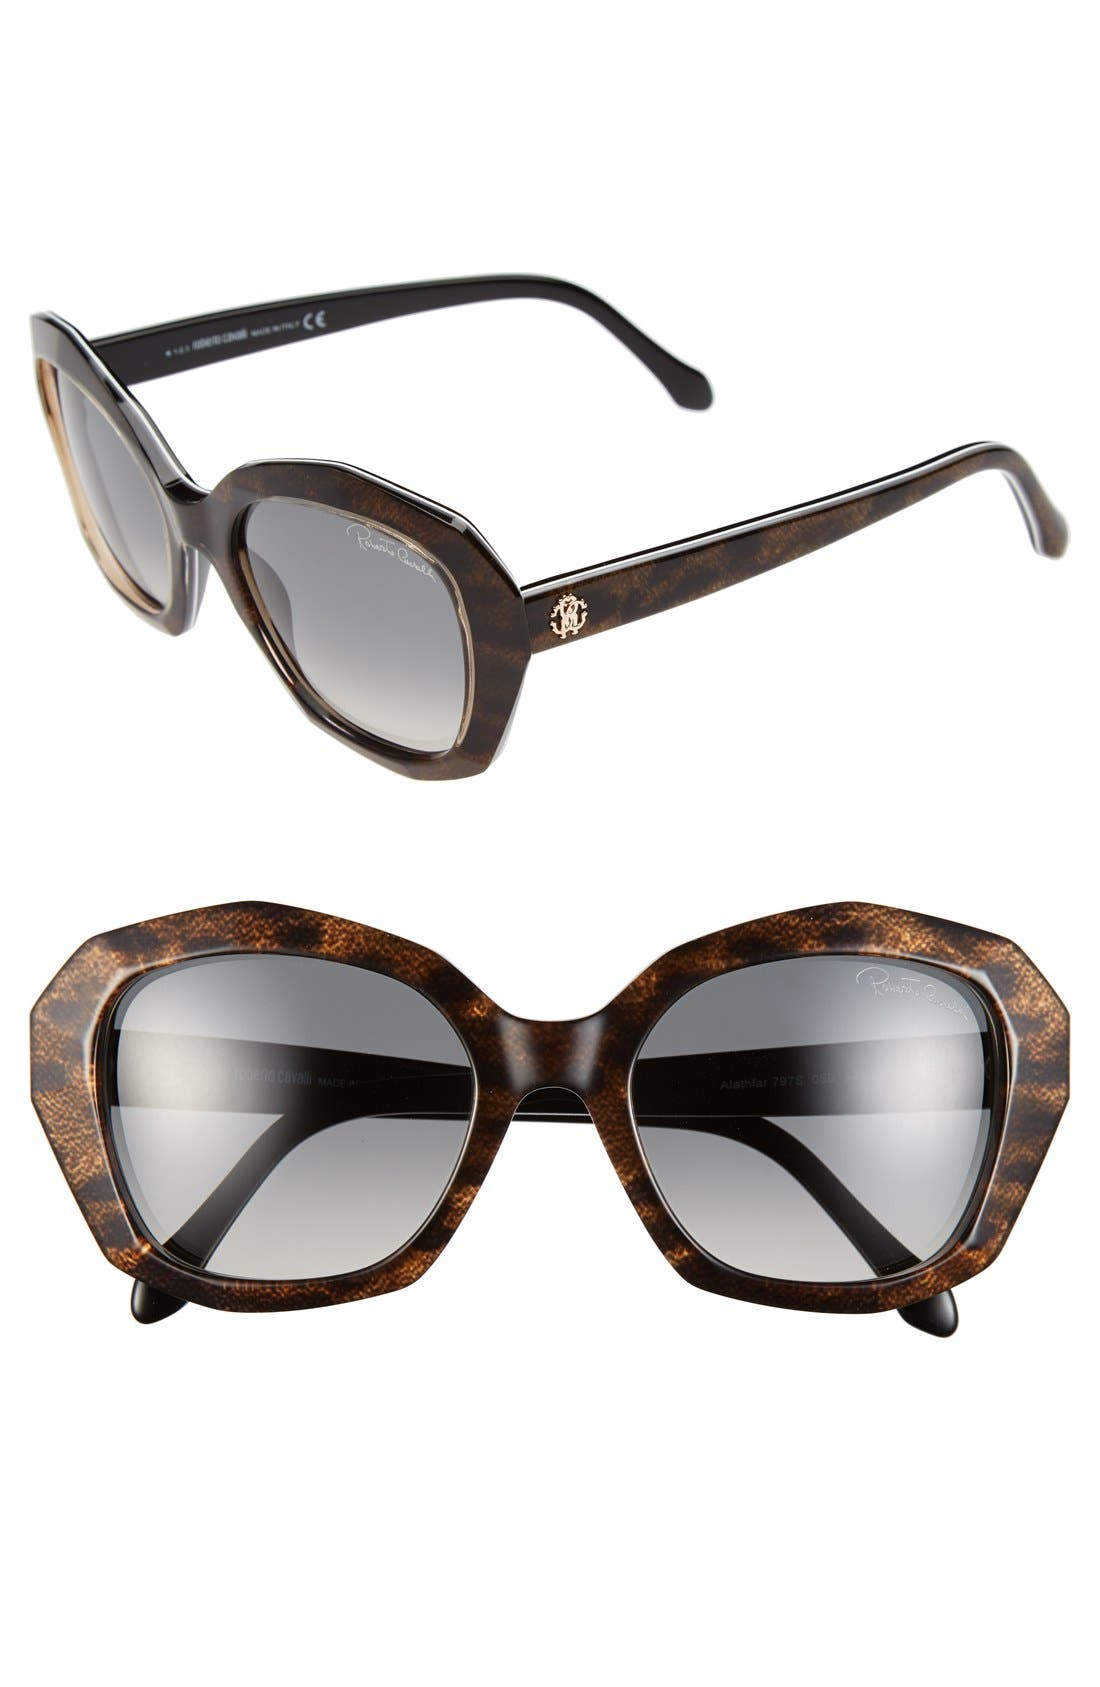 Alternate Image 1 Selected - Roberto Cavalli 'Alathfar' 54mm Sunglasses